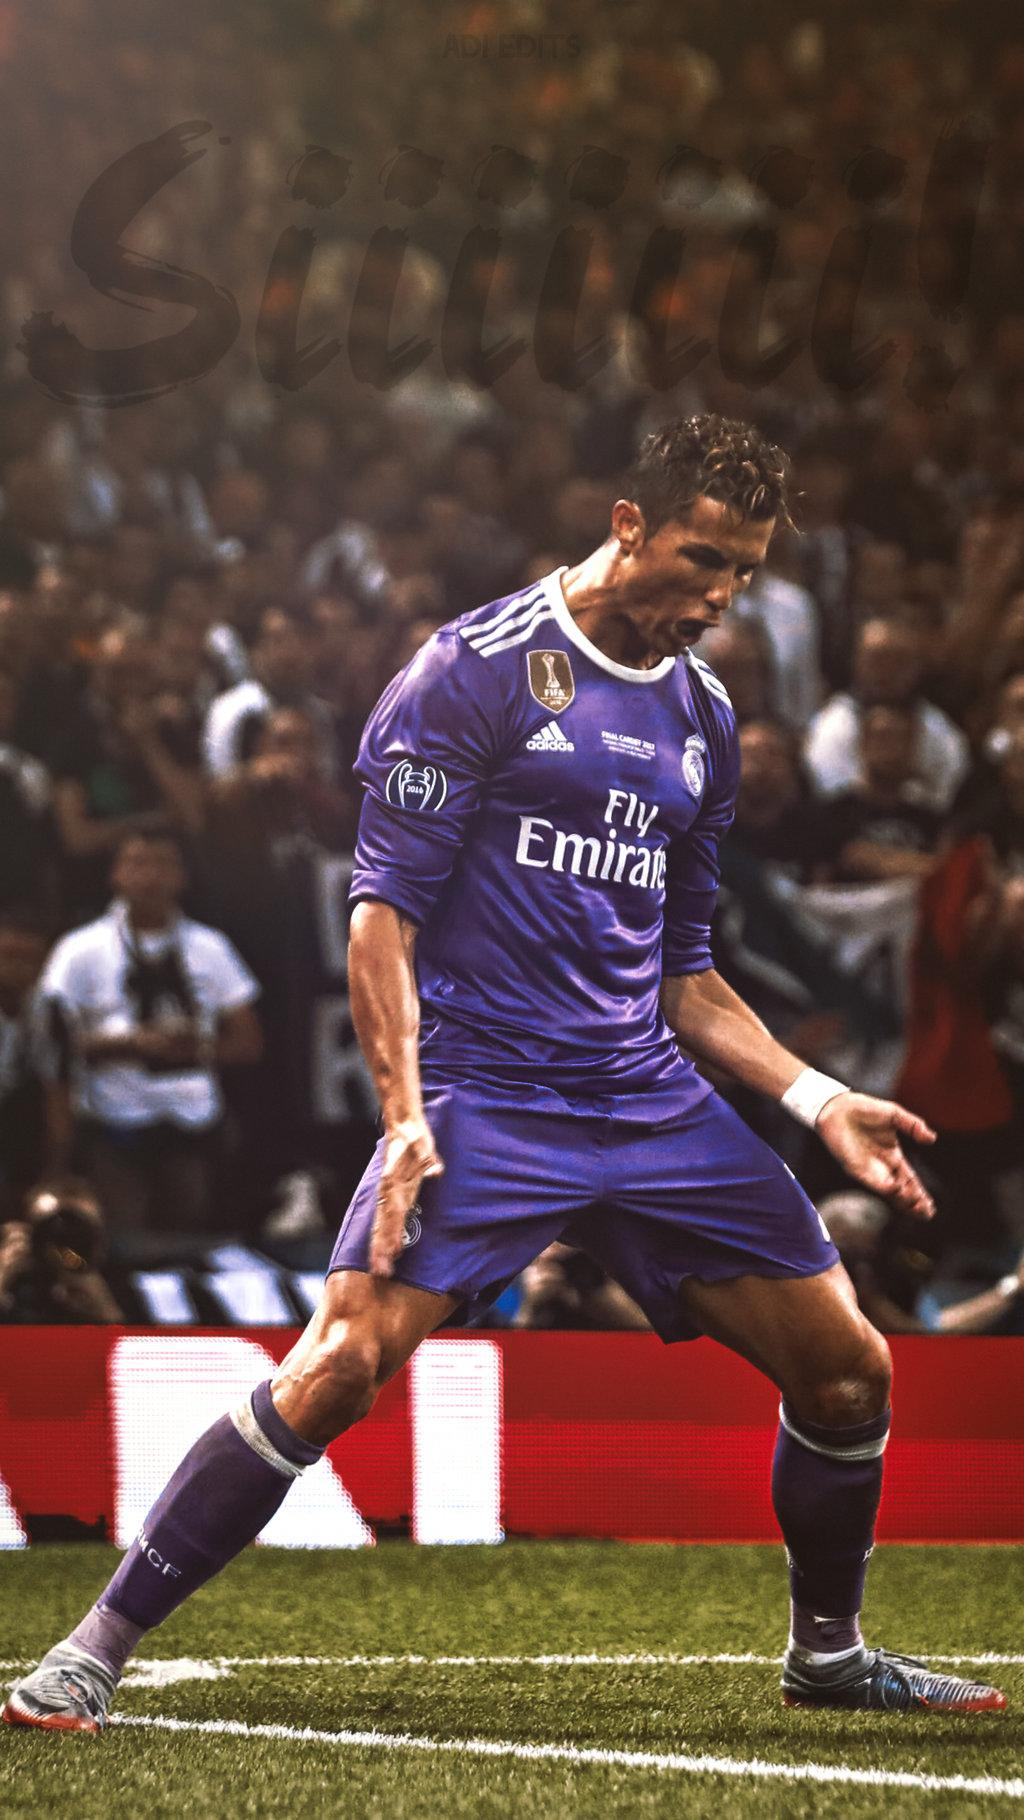 Cristiano Ronaldo Hd Mobile Wallpapers Cristiano Ronaldo Real Madrid Ronaldo Wallpaper Iphone 1024x1820 Download Hd Wallpaper Wallpapertip